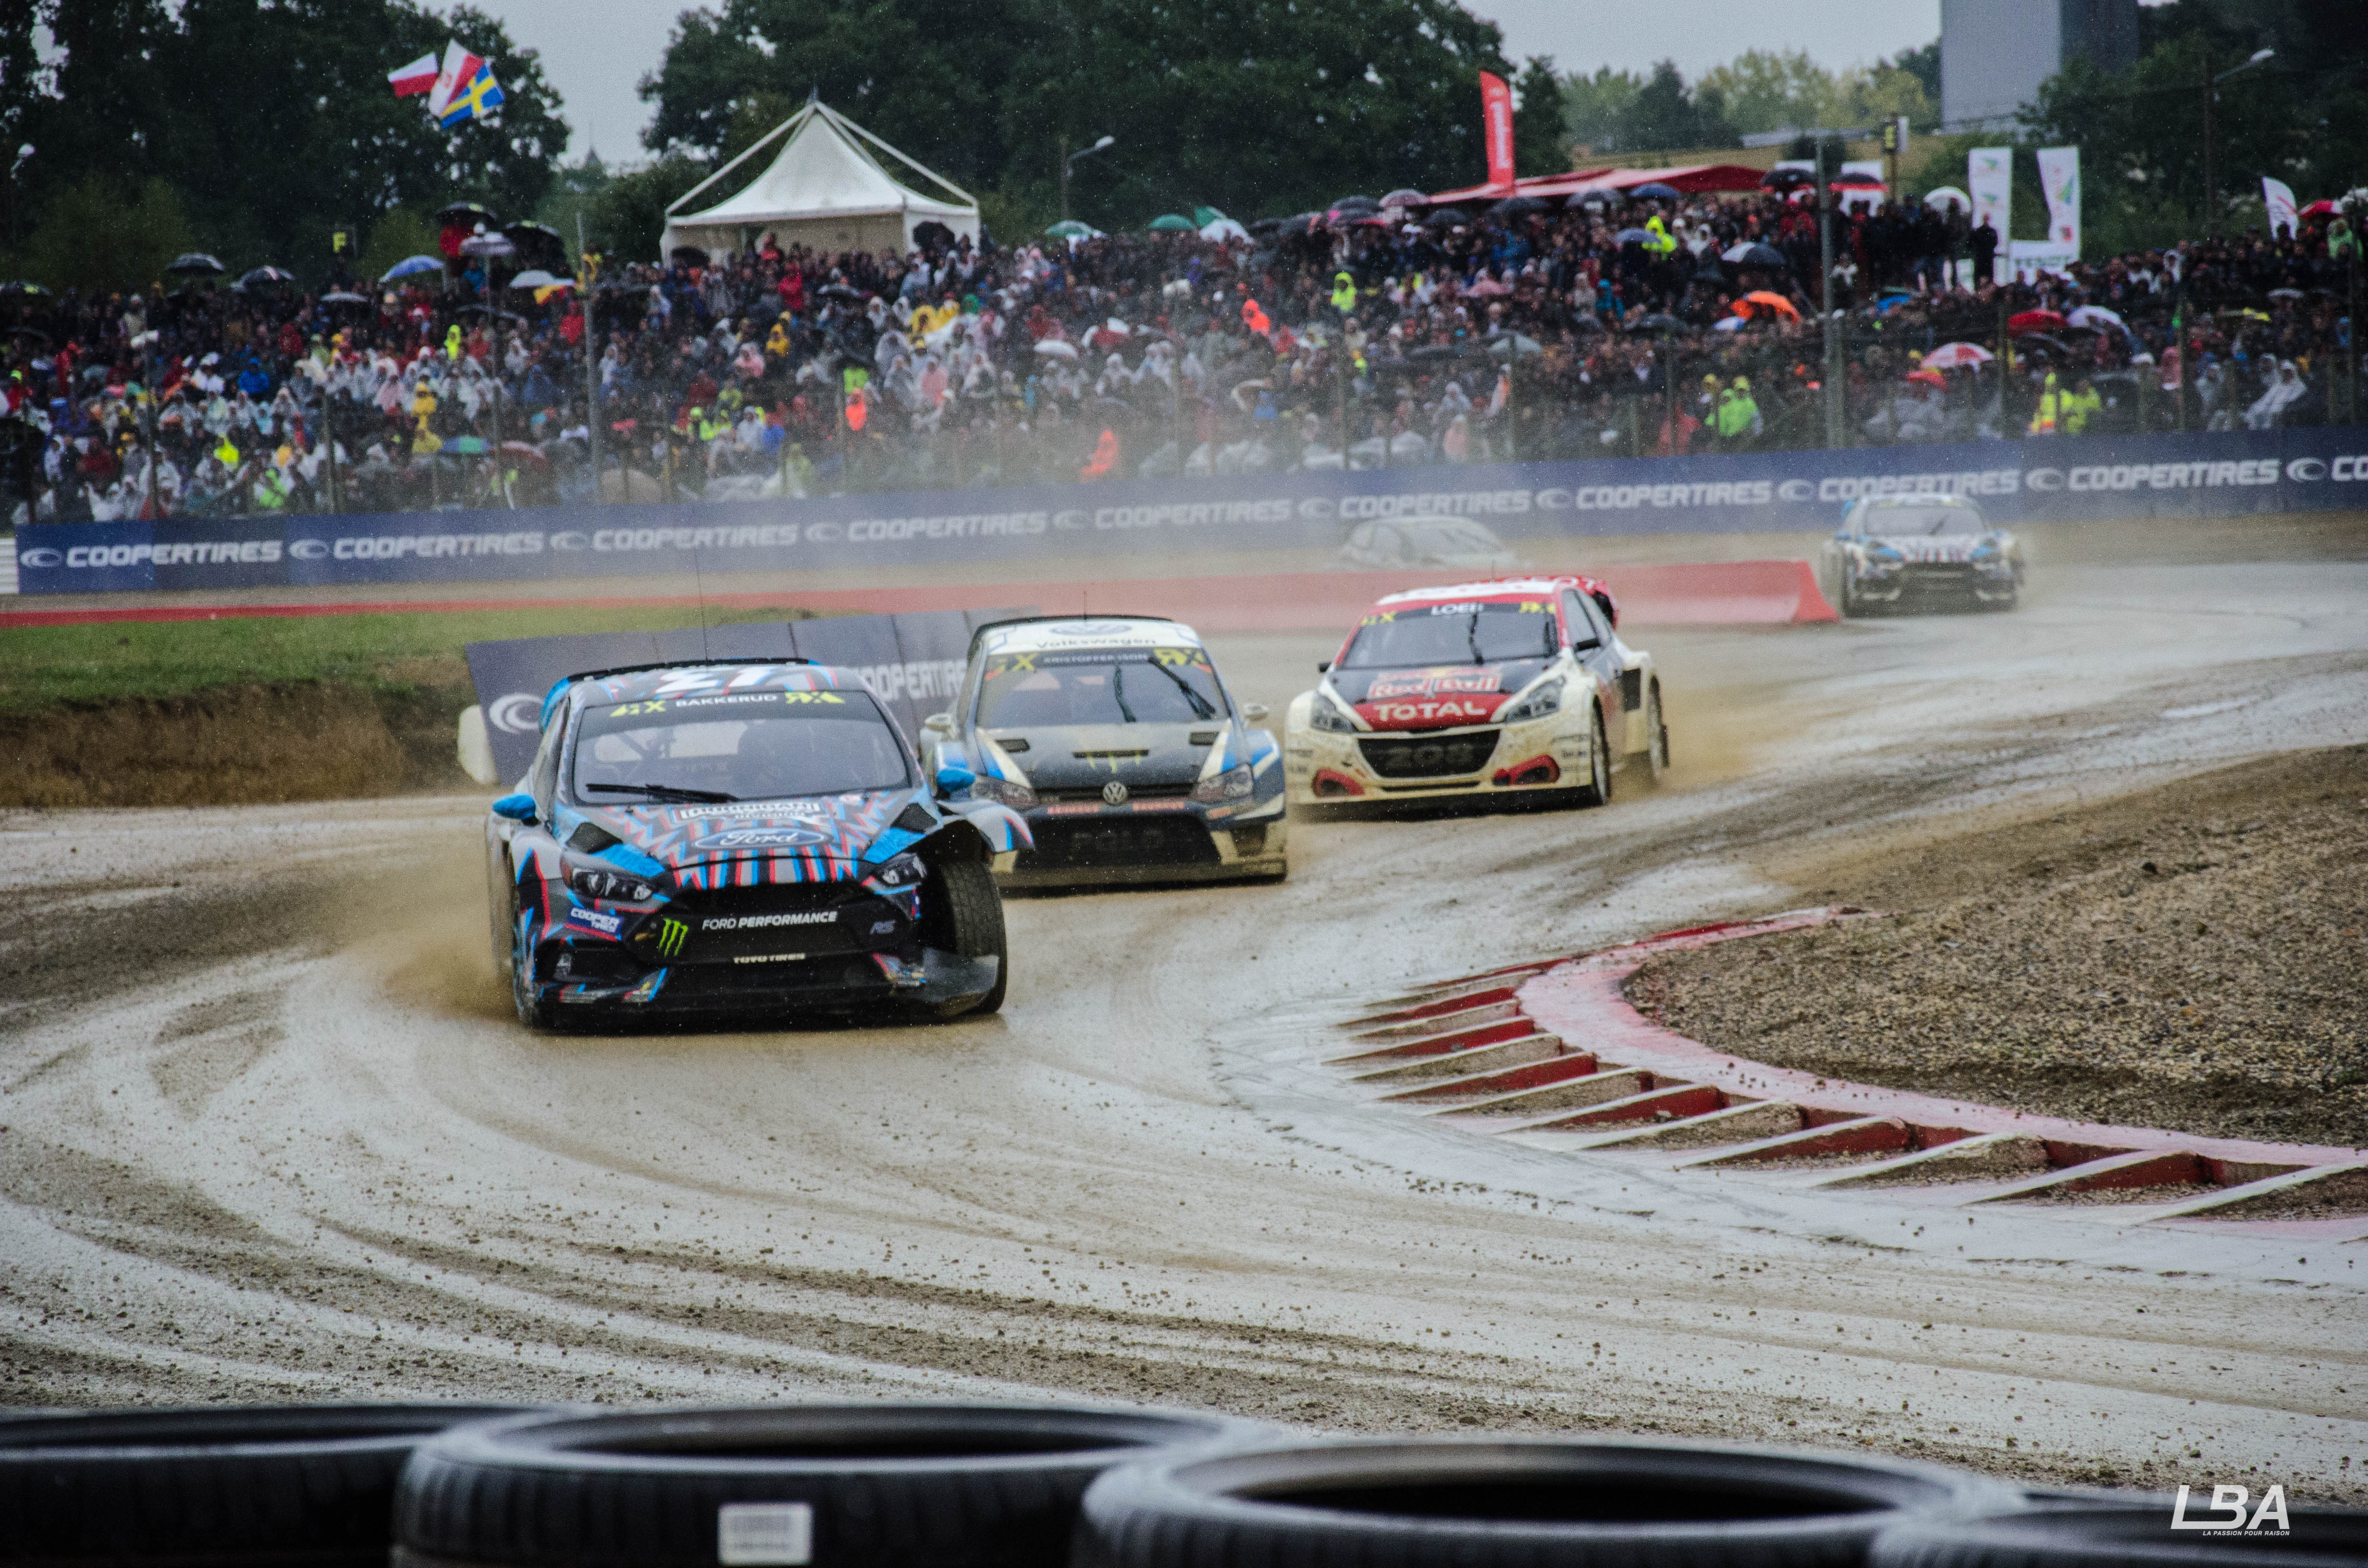 peugeot-vw-ford-rallycross